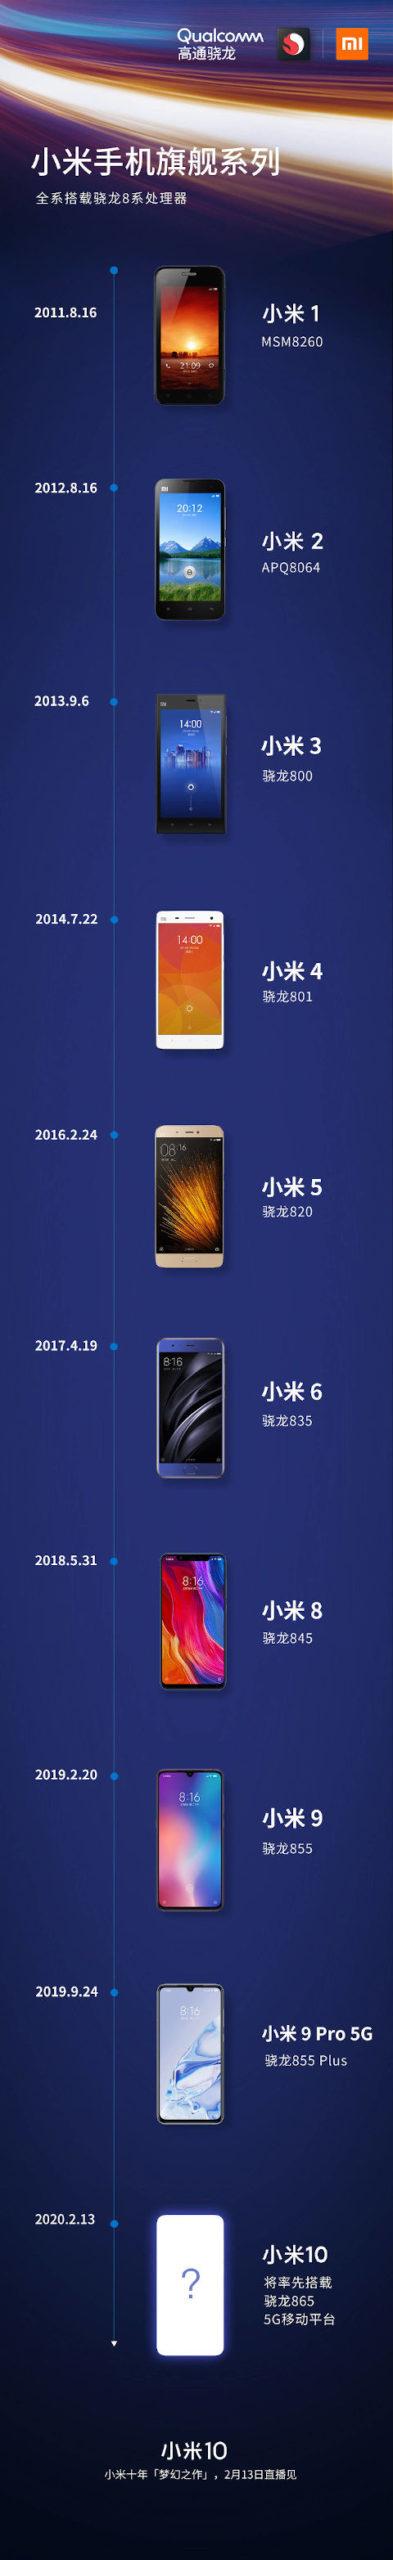 Comprar Xiaomi Mi Series en kiboTEK España